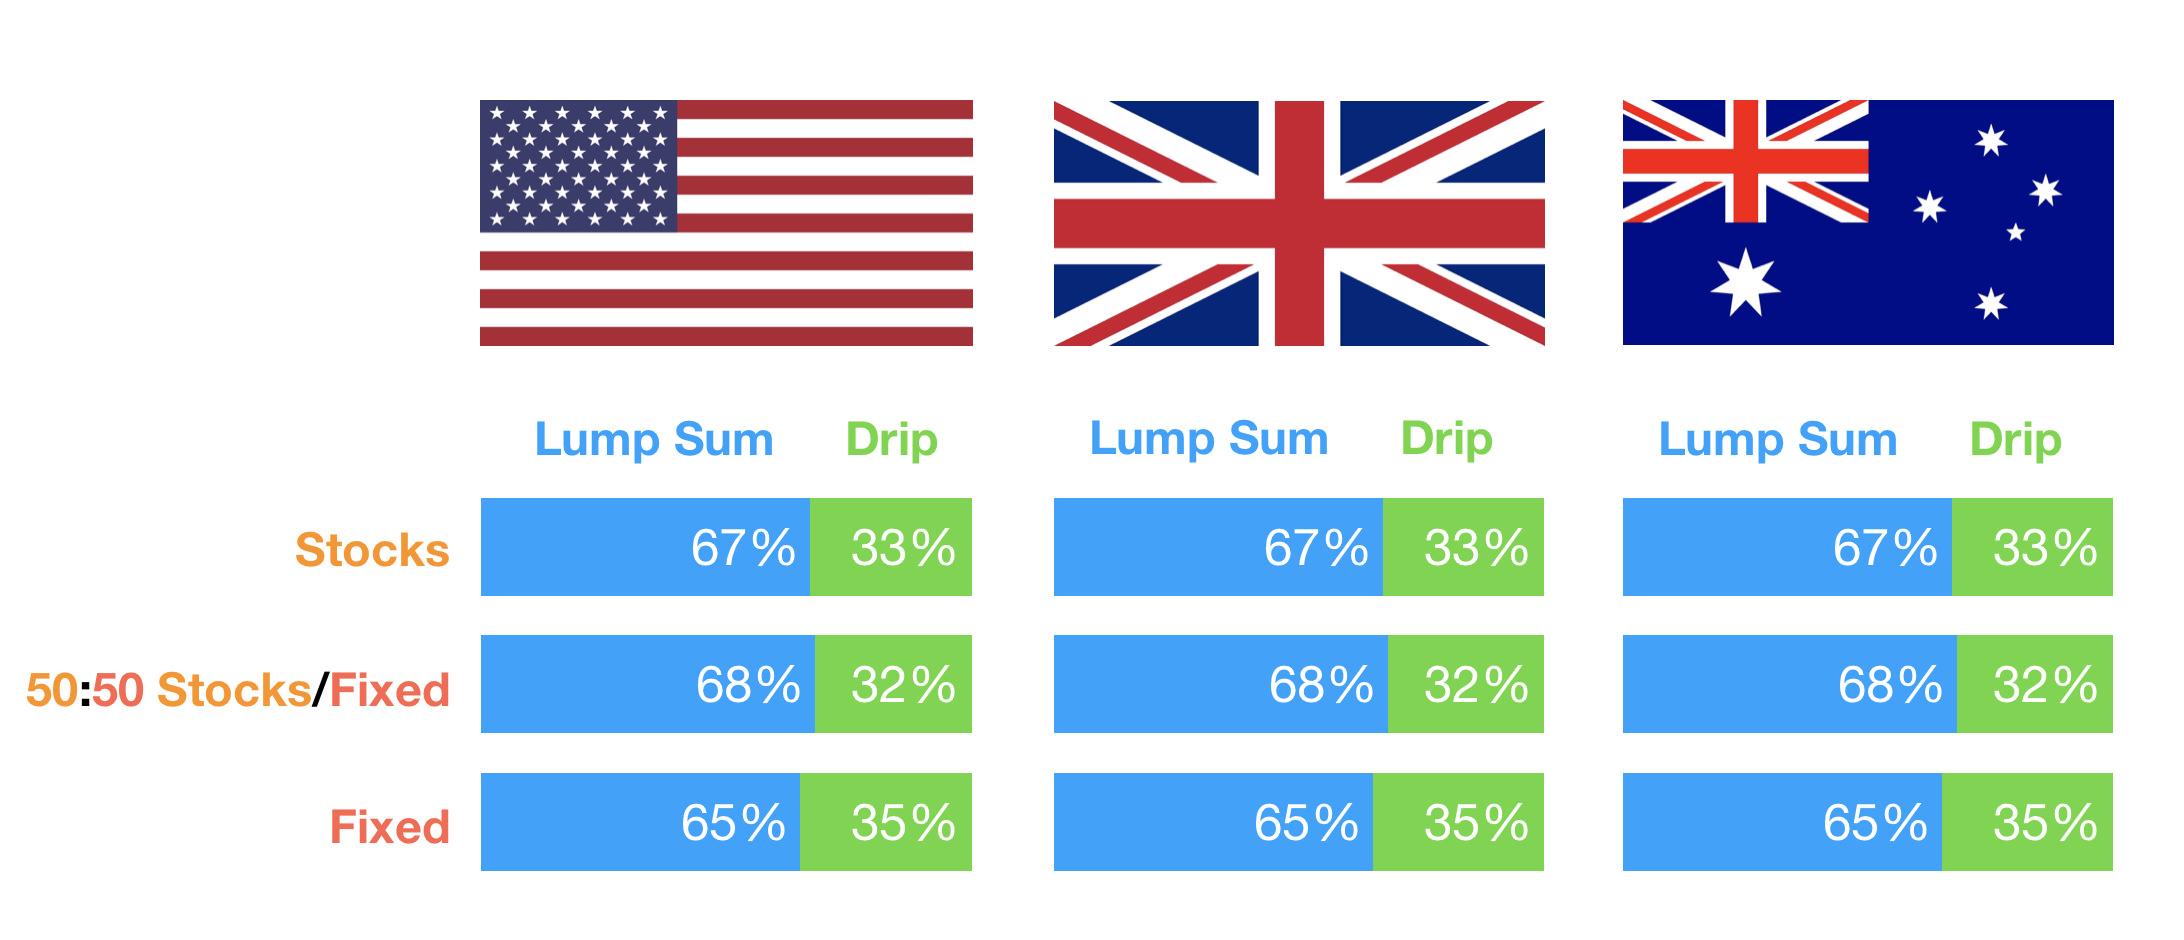 Lump Sum vs Drip Feeding Results - Various Stock/Bond Portfolios - USA, UK and Australia